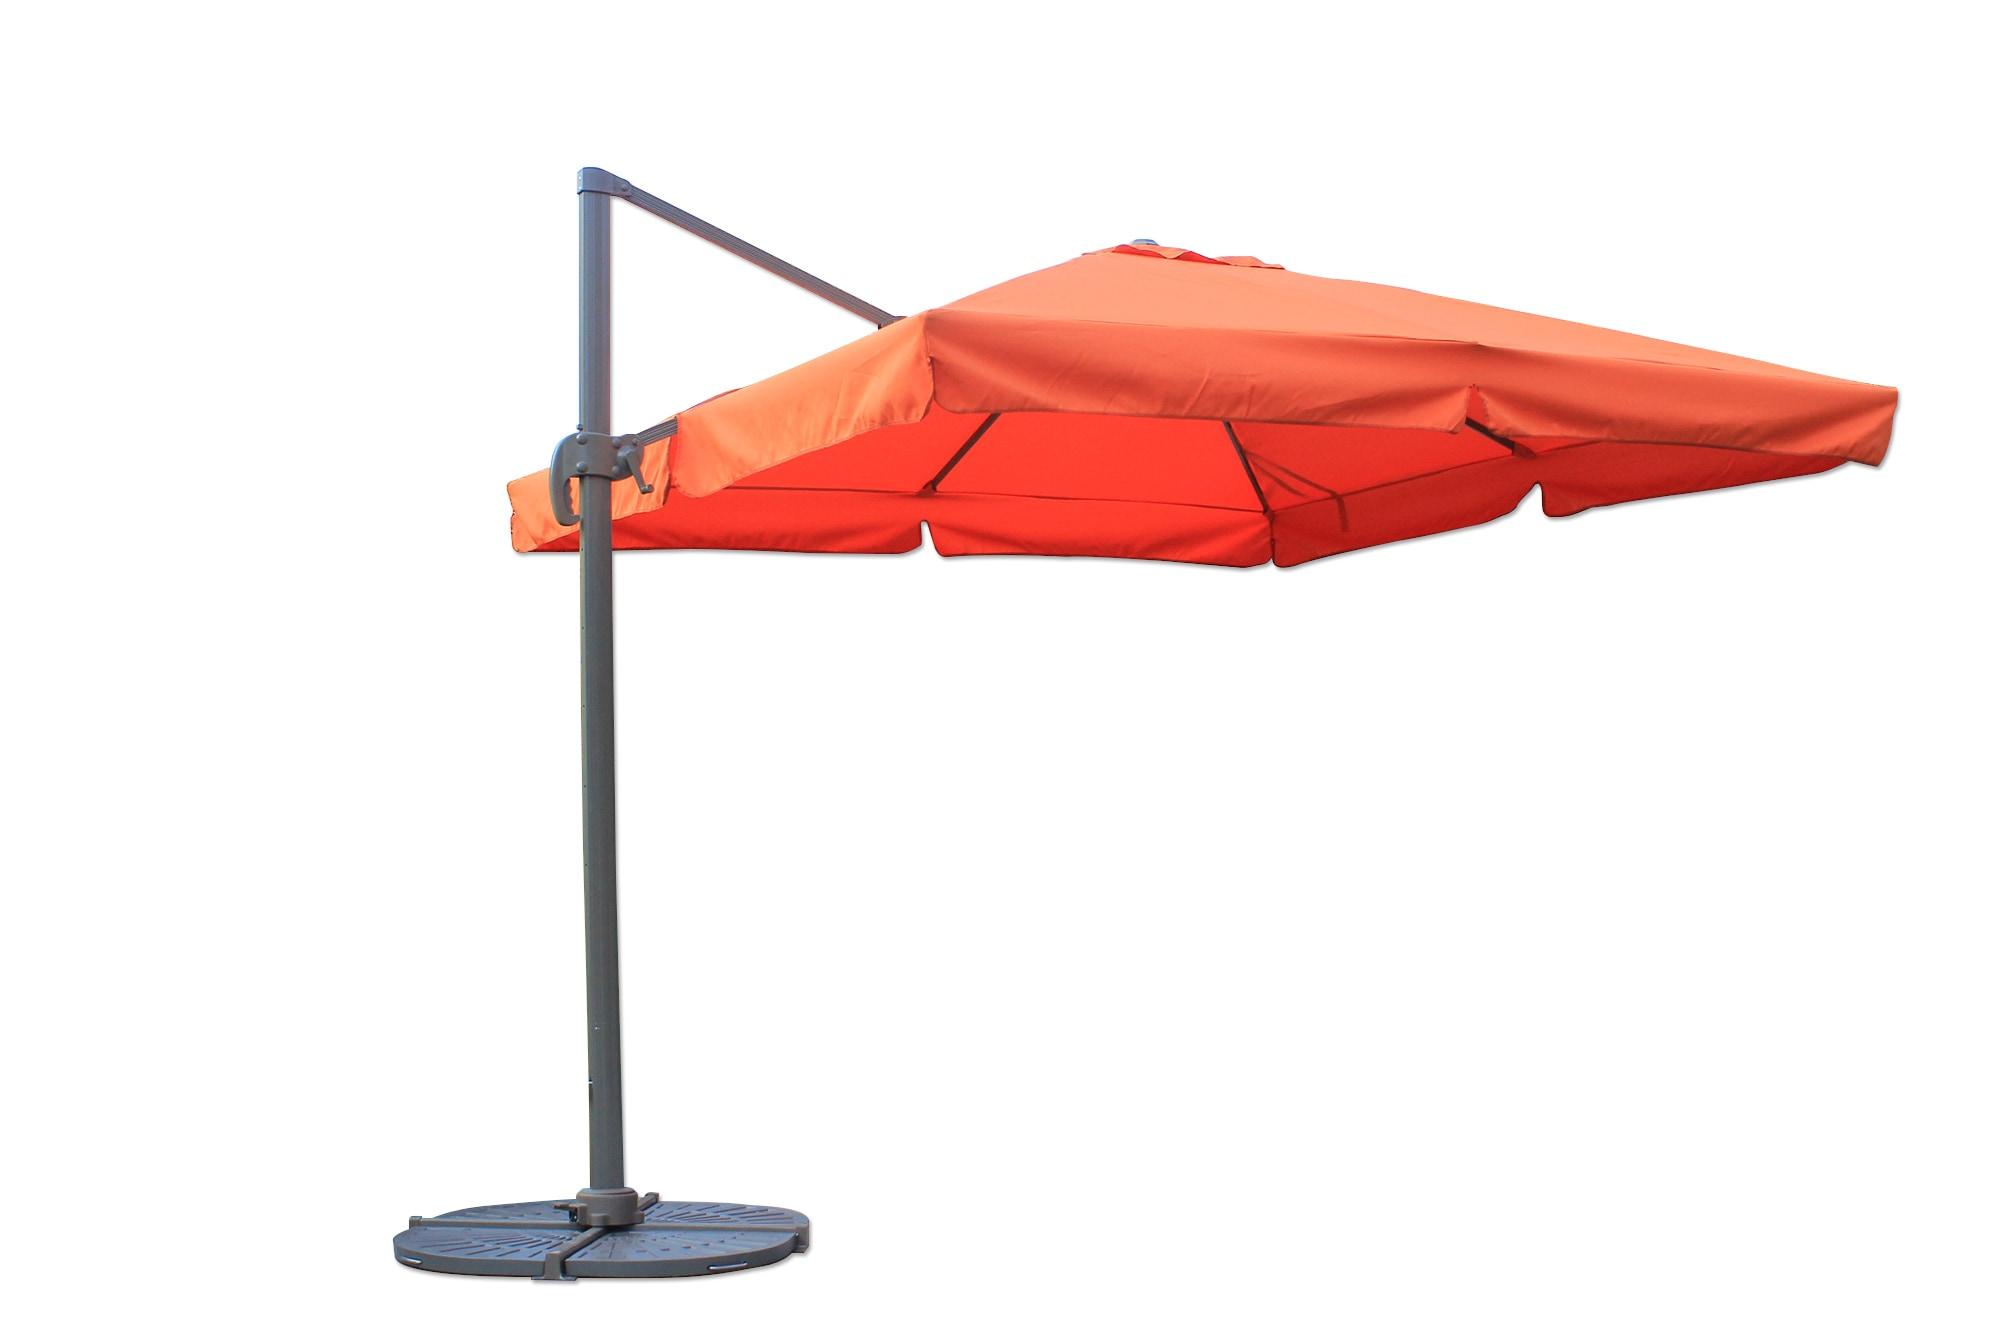 10 ft Square Offset Roma Umbrella - Terracotta Shade & Cooling Offset Patio Umbrellas 0